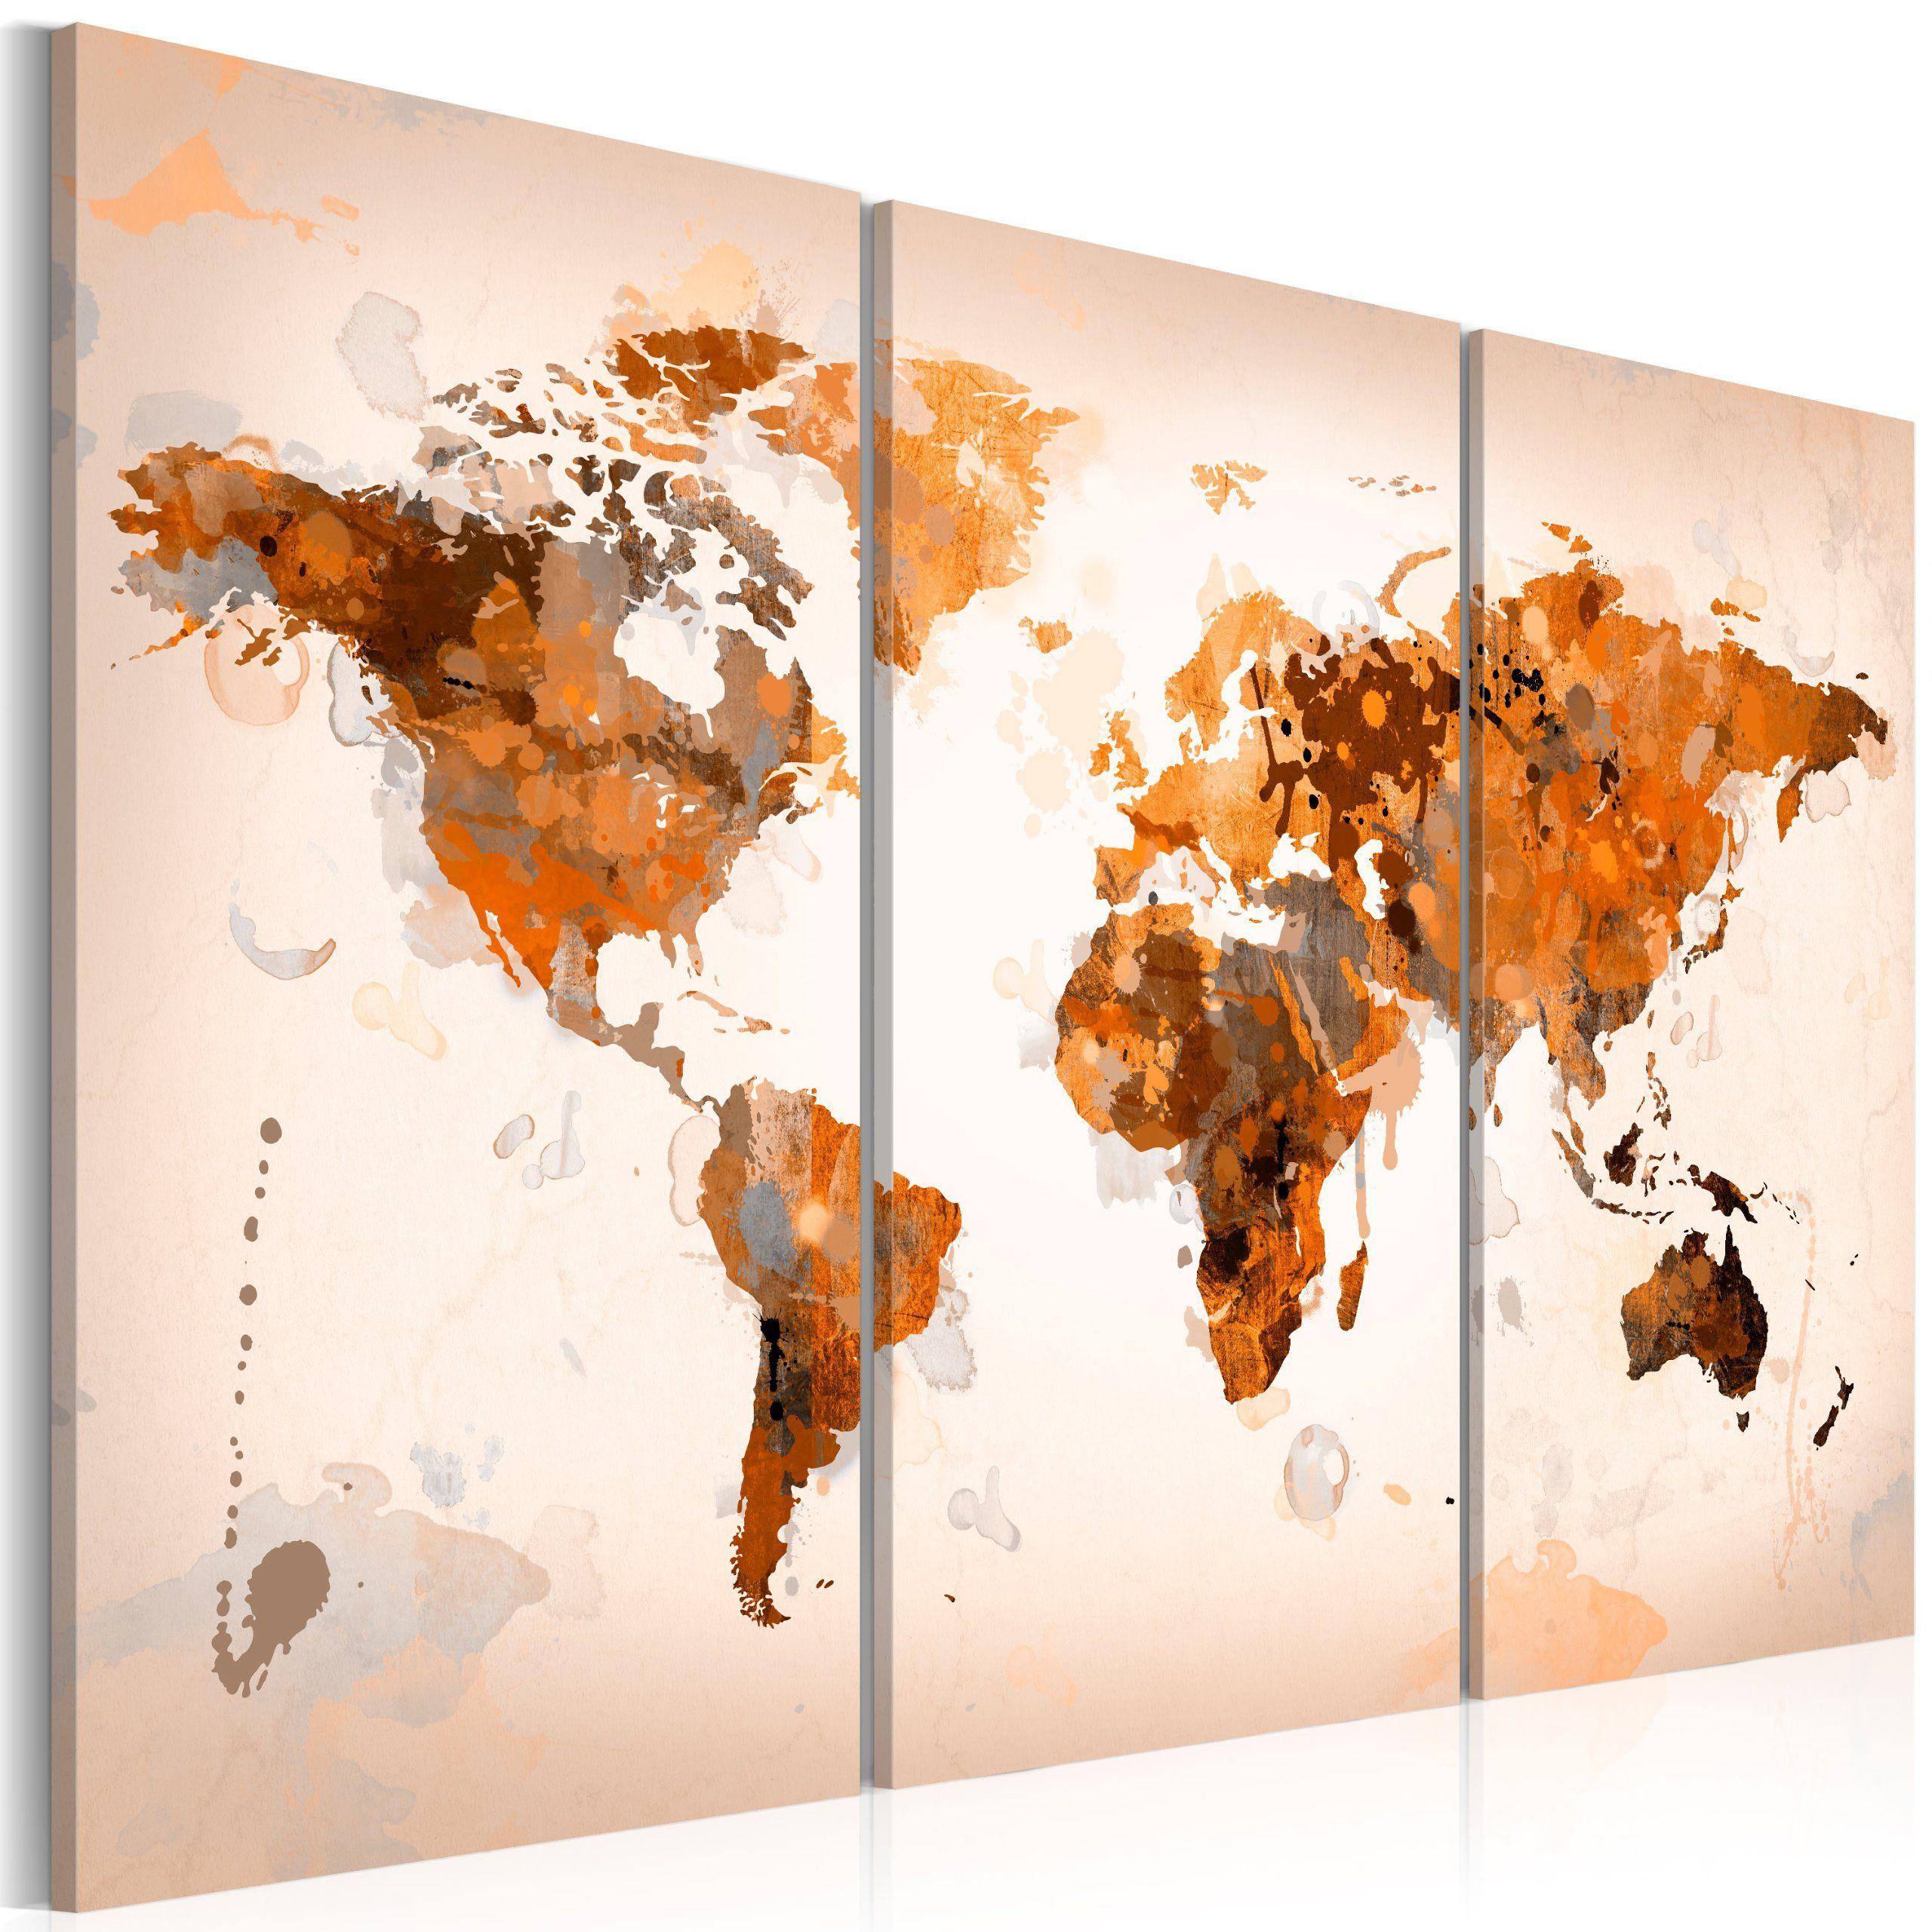 grand format impression sur toile images 3 parties carte du monde tableau 020113 251. Black Bedroom Furniture Sets. Home Design Ideas